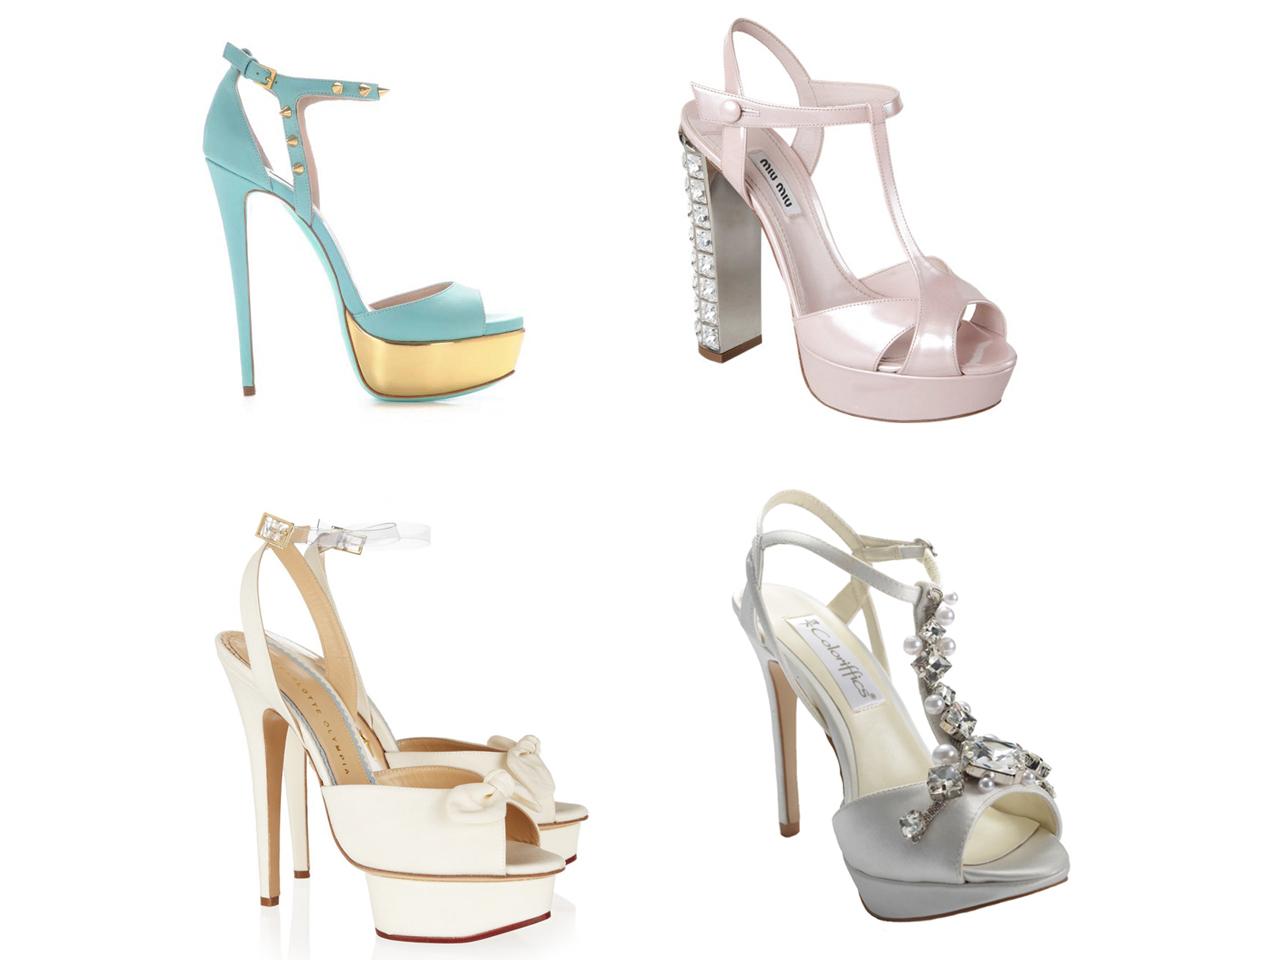 Bobbie BrideSee Wedding The Shoes Winning FK1lcJ